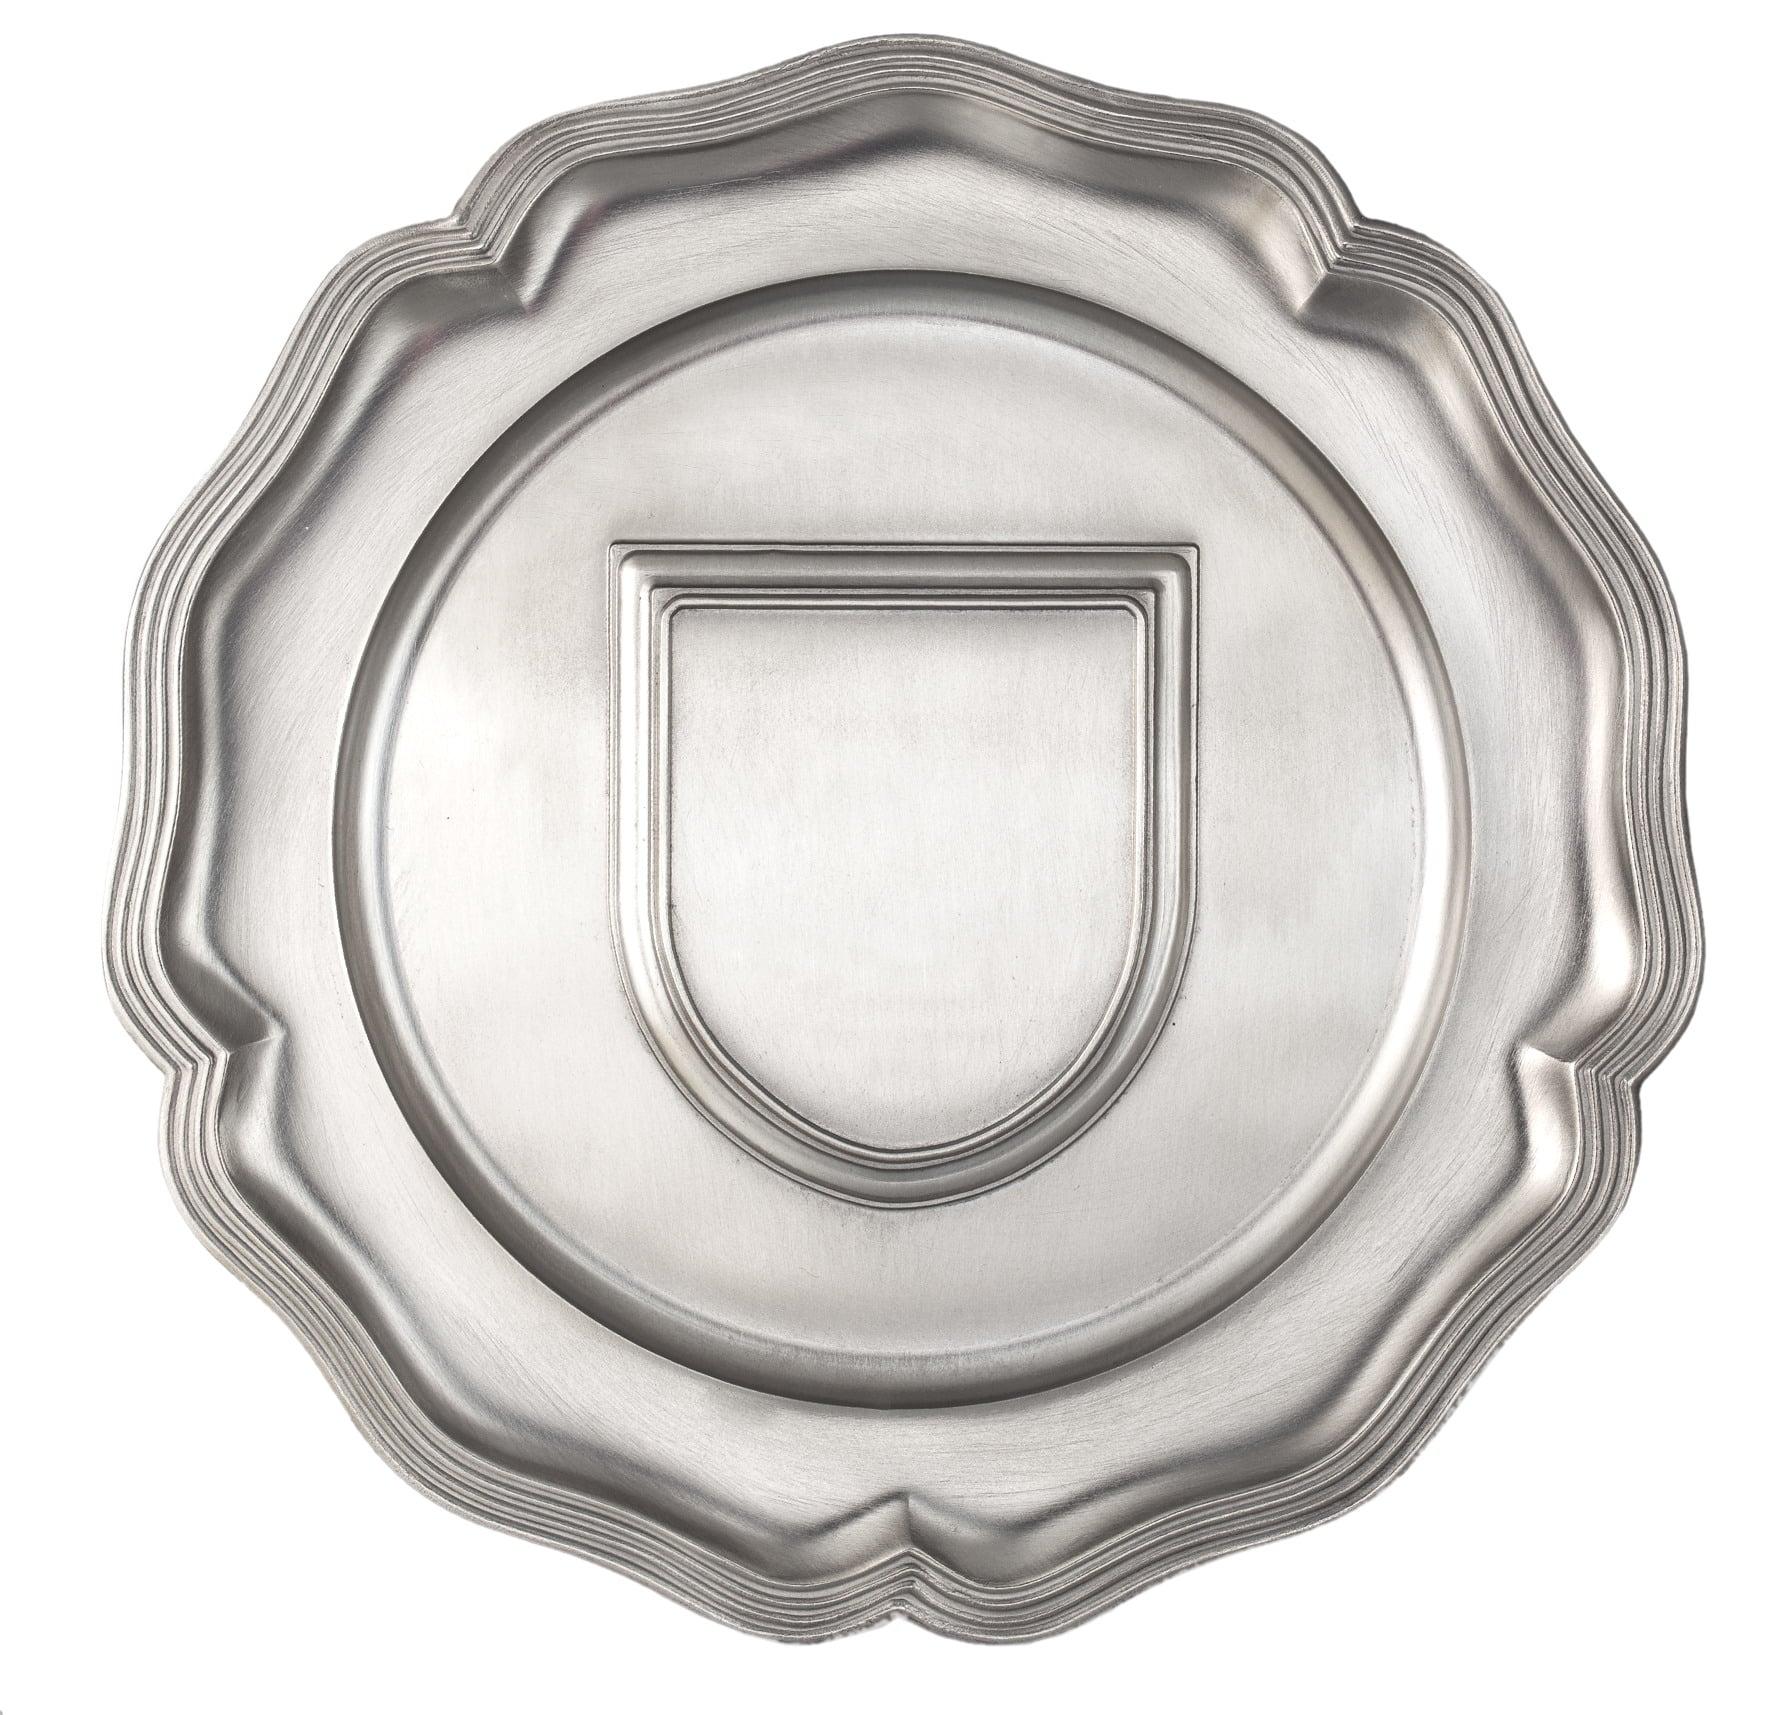 Metallteller Zinnteller 1151